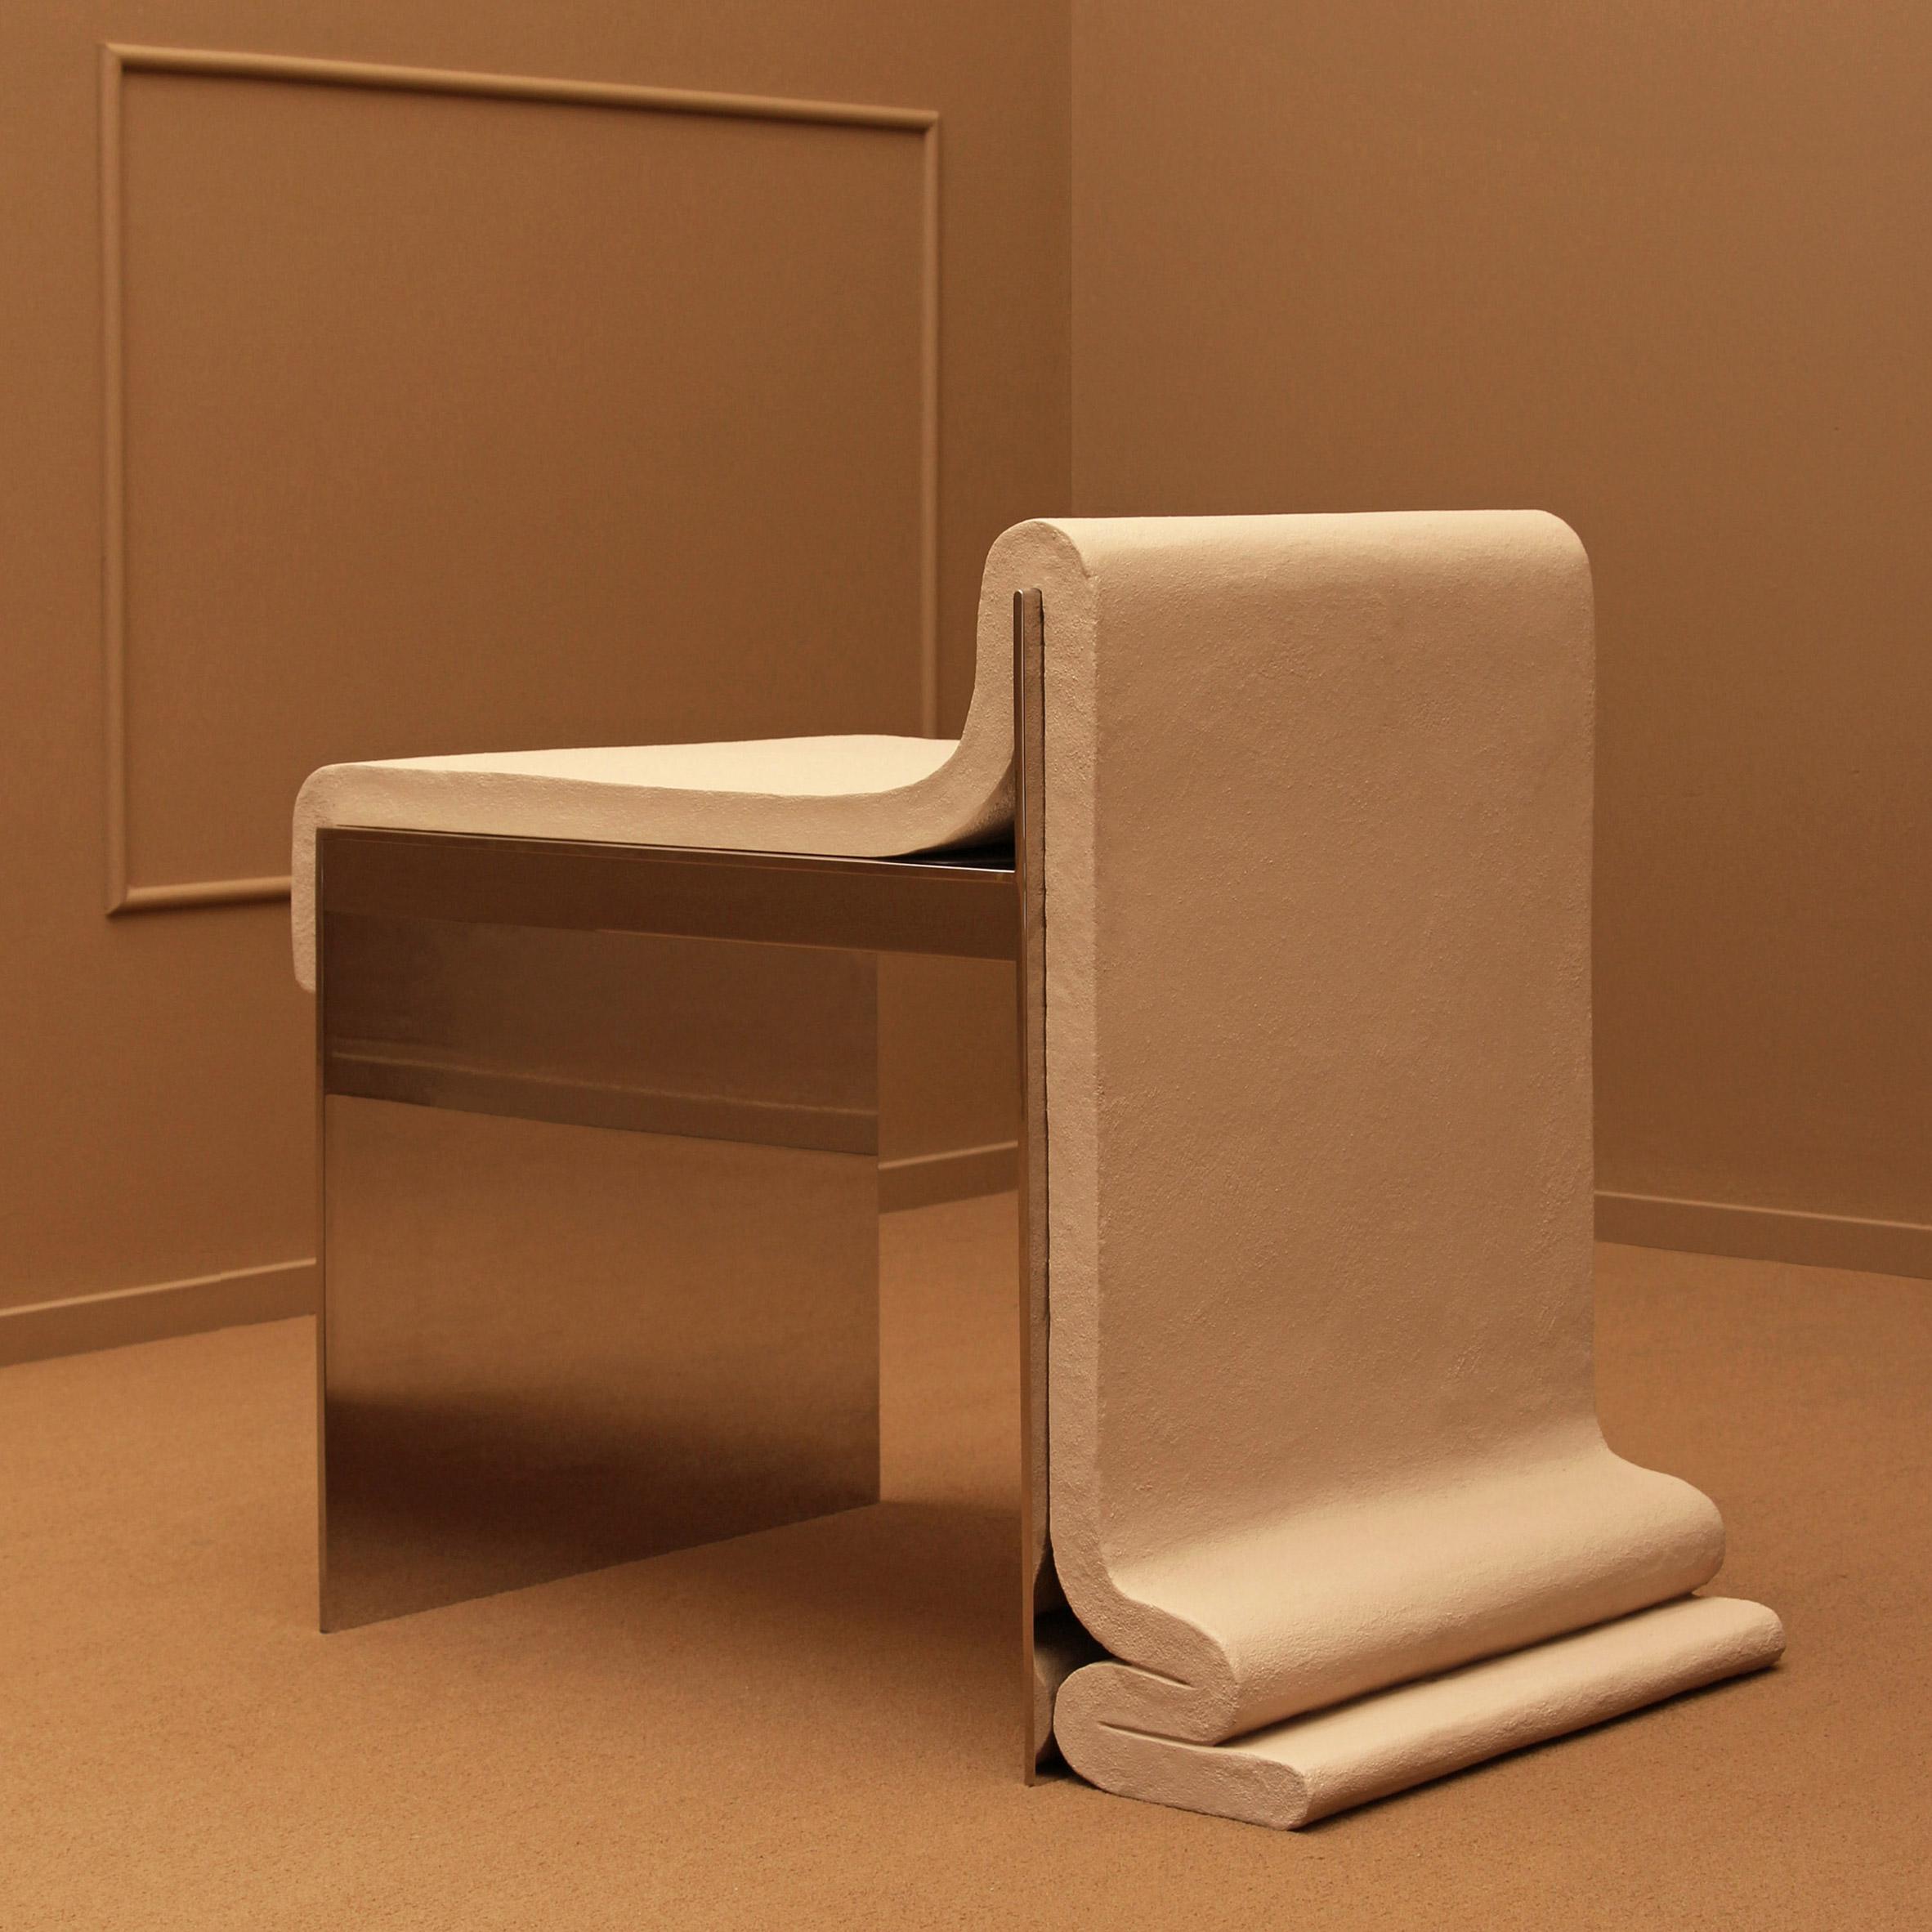 concrete-melt-chair-bower-studios-the-future-perfect-sq-1